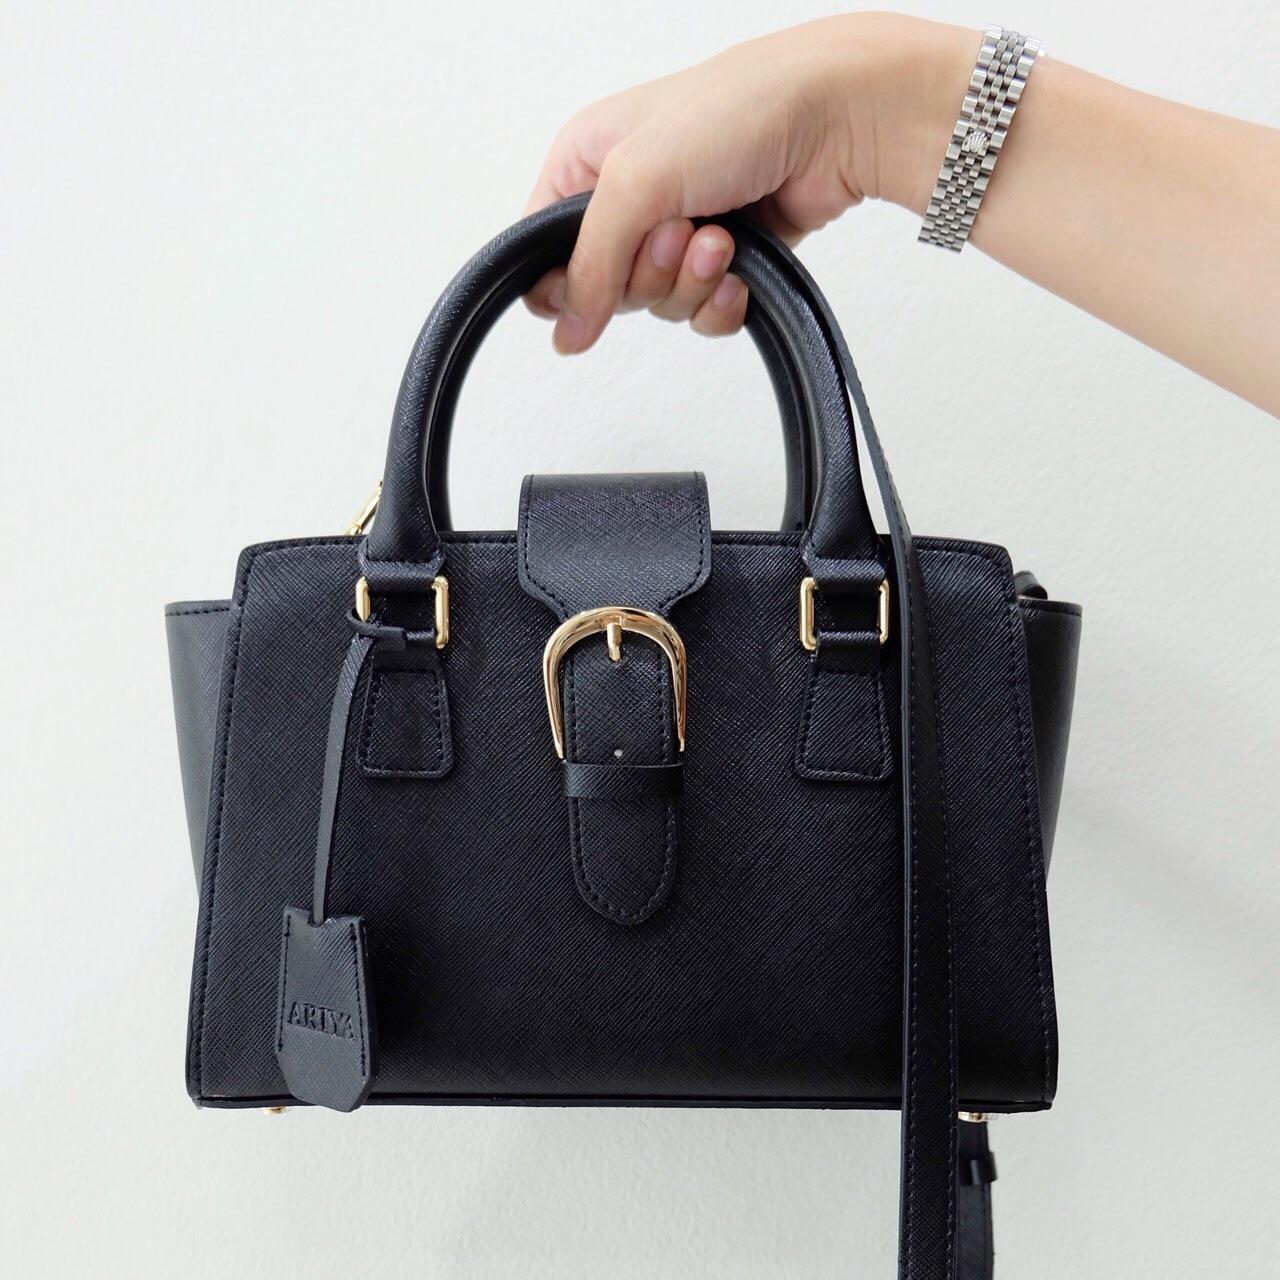 ARIYABAGS,กระเป๋า,กระเป๋าถือ,กระเป๋าหนัง,Bag